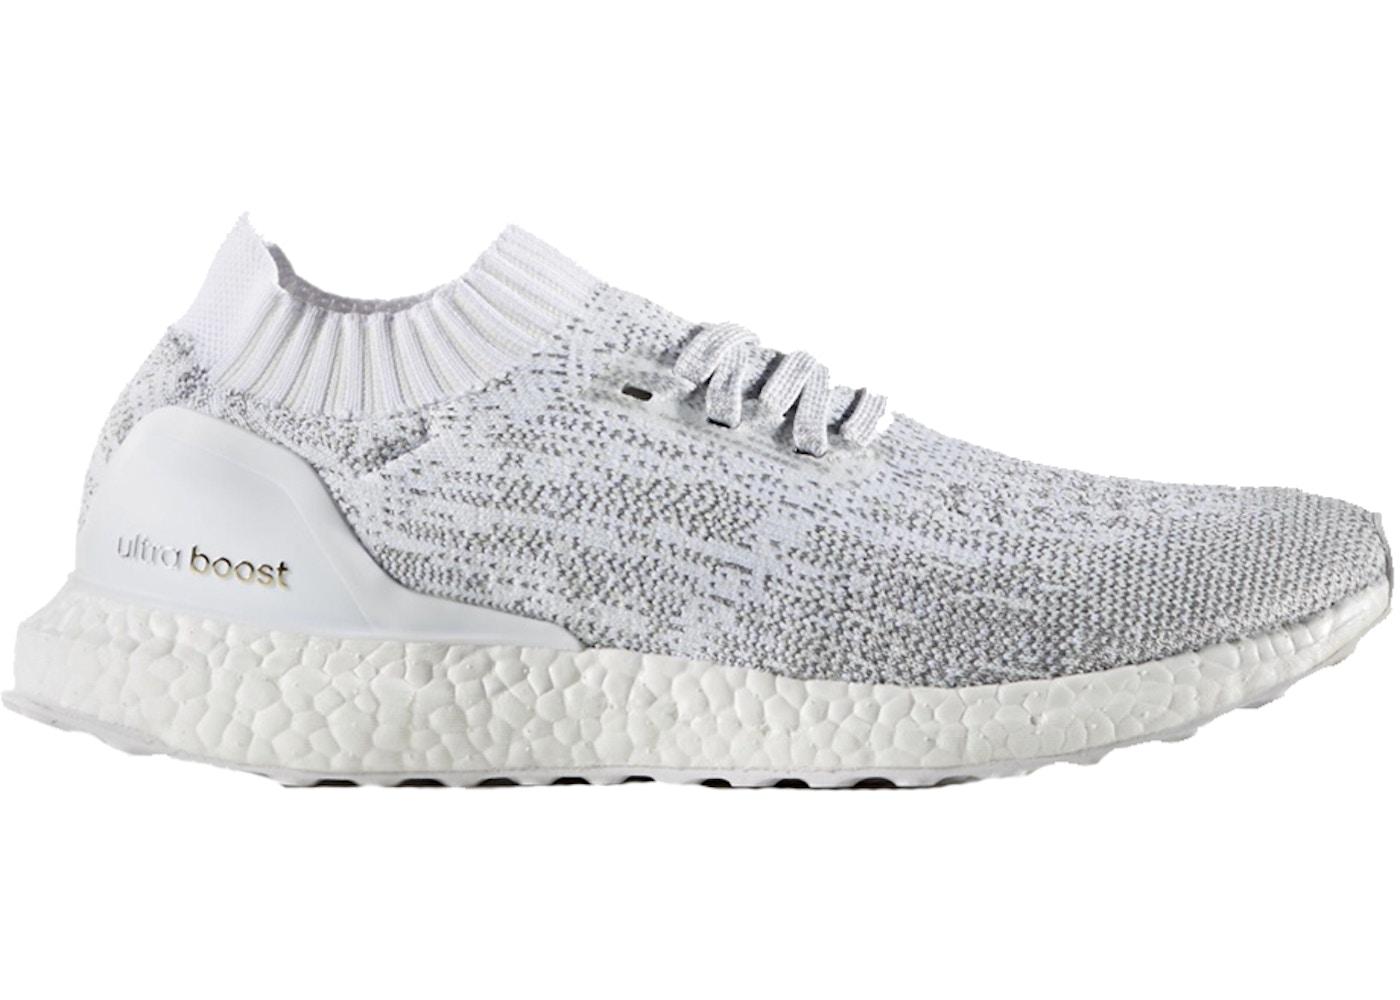 727aa64e7 adidas Ultra Boost Size 12 Shoes - Volatility